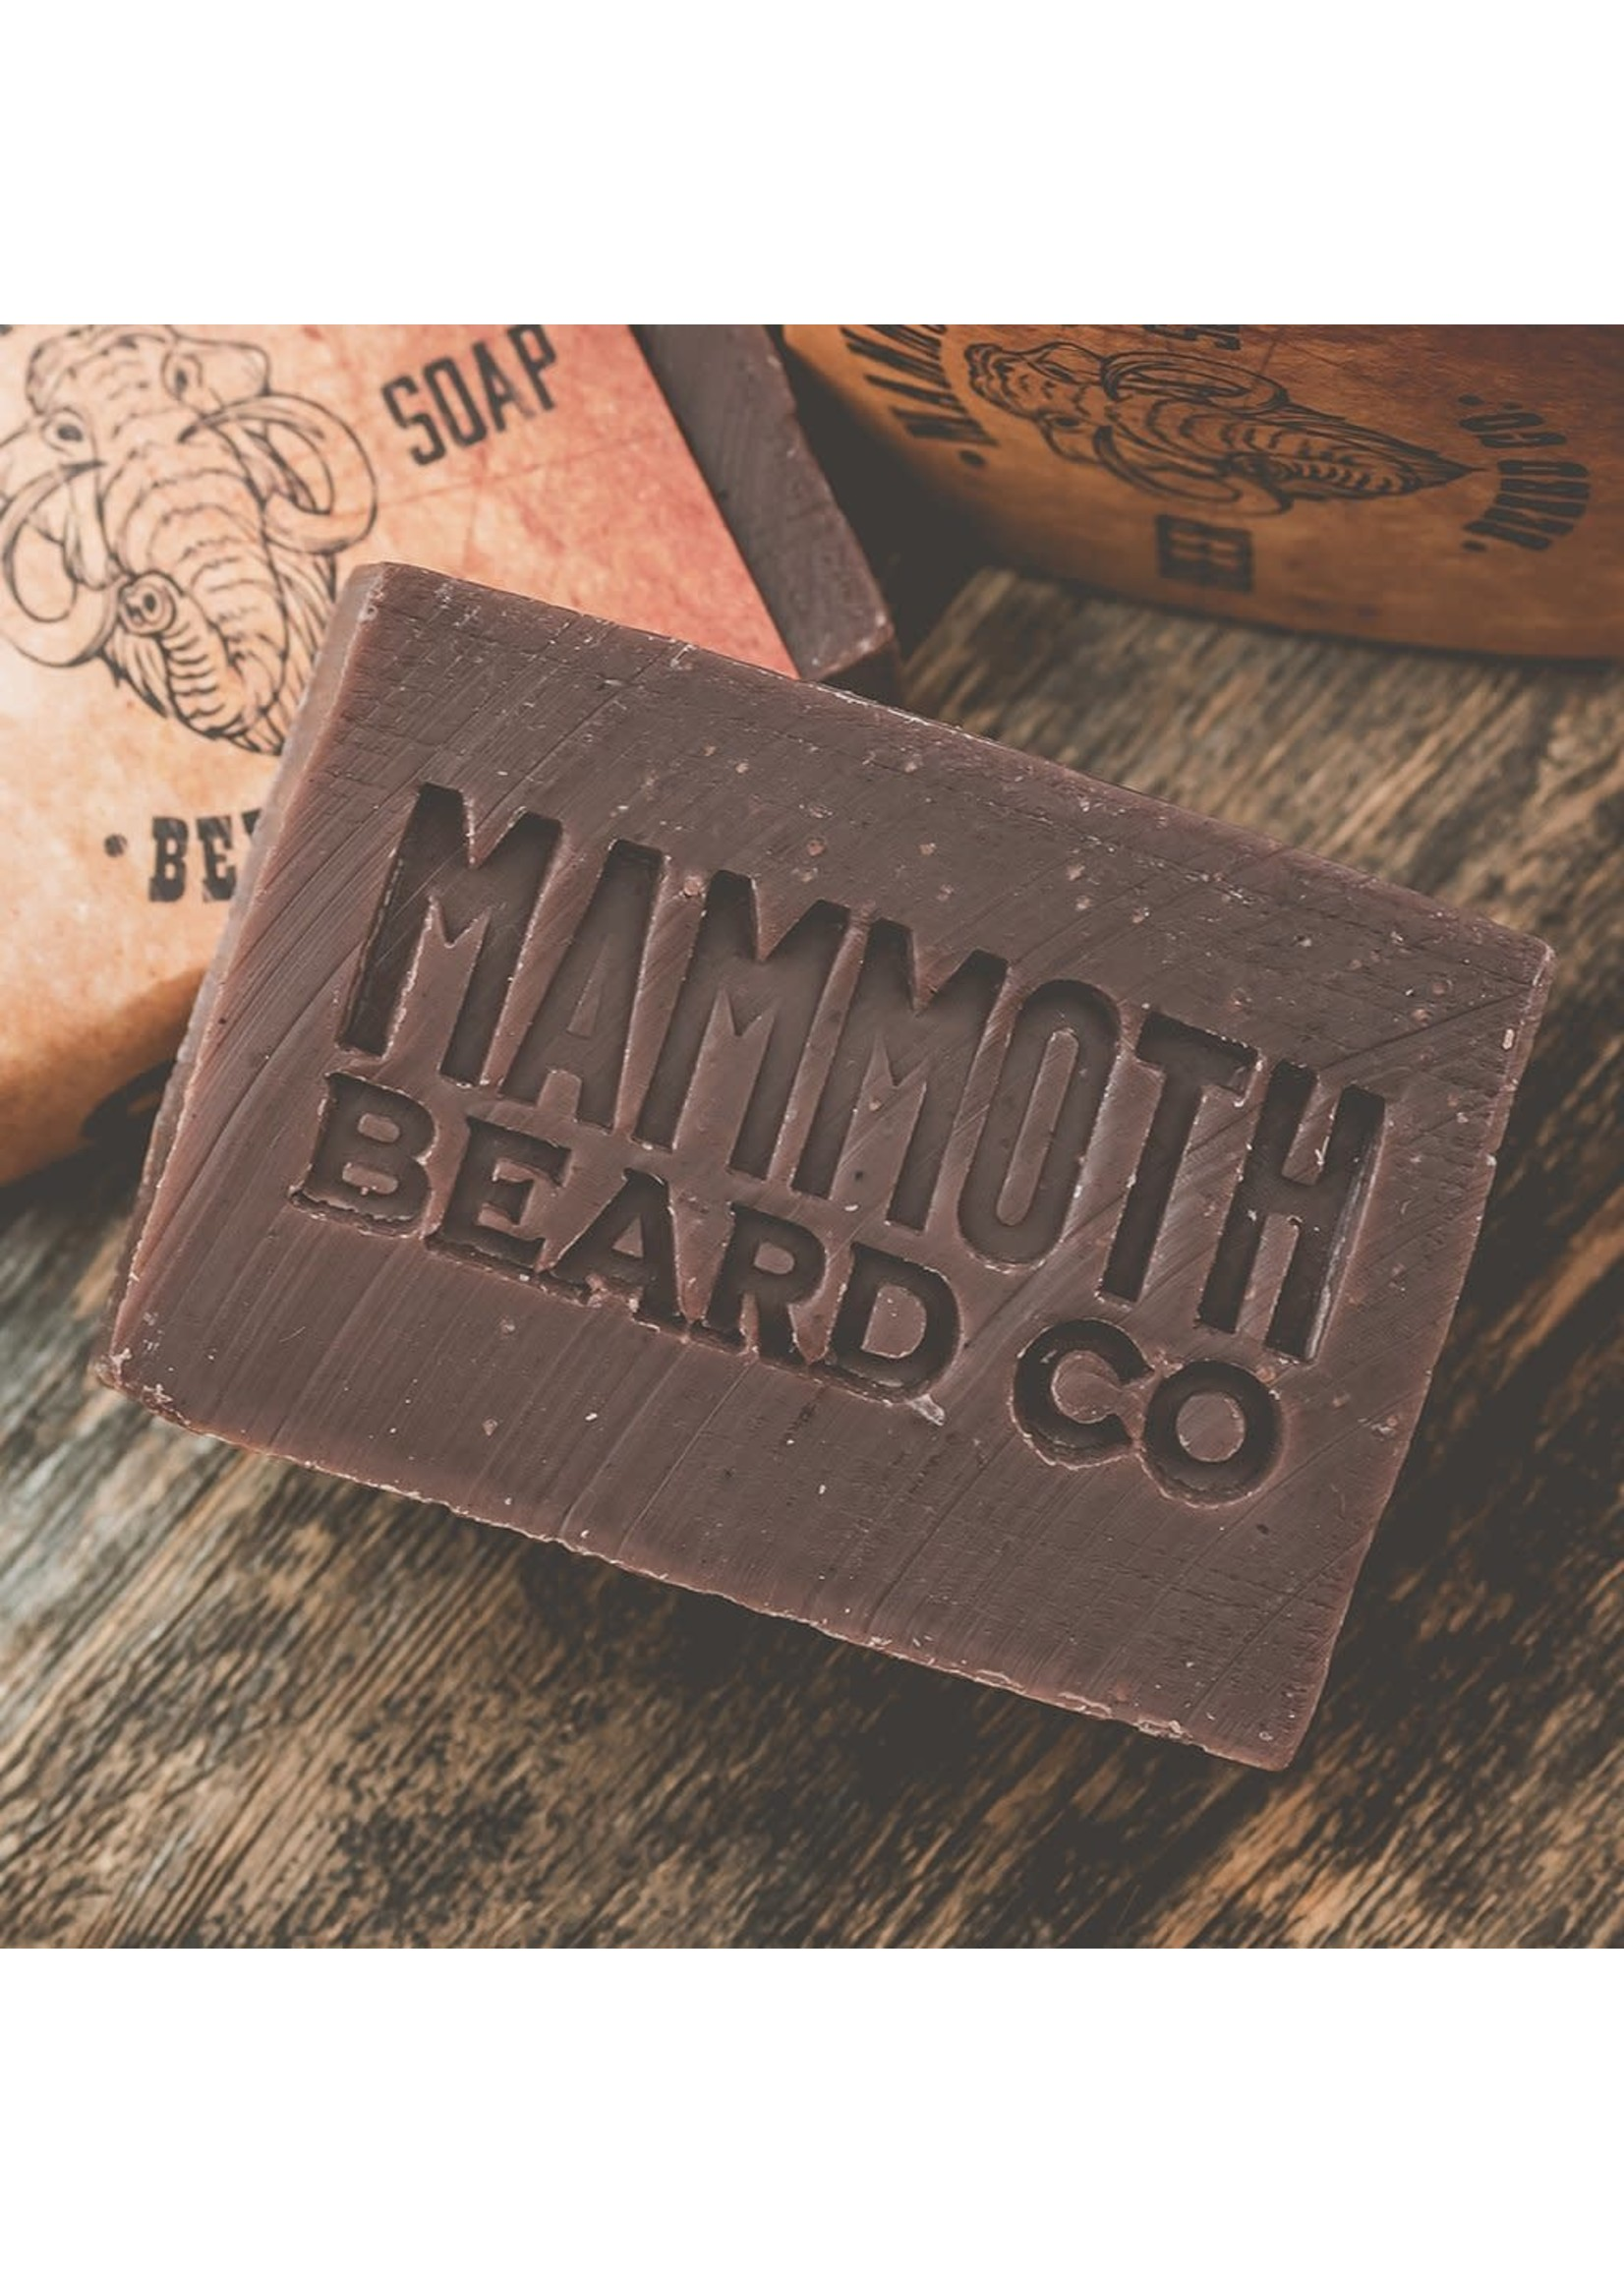 Mammoth Beard Co. Big Rock Beer Beard and Body Soap